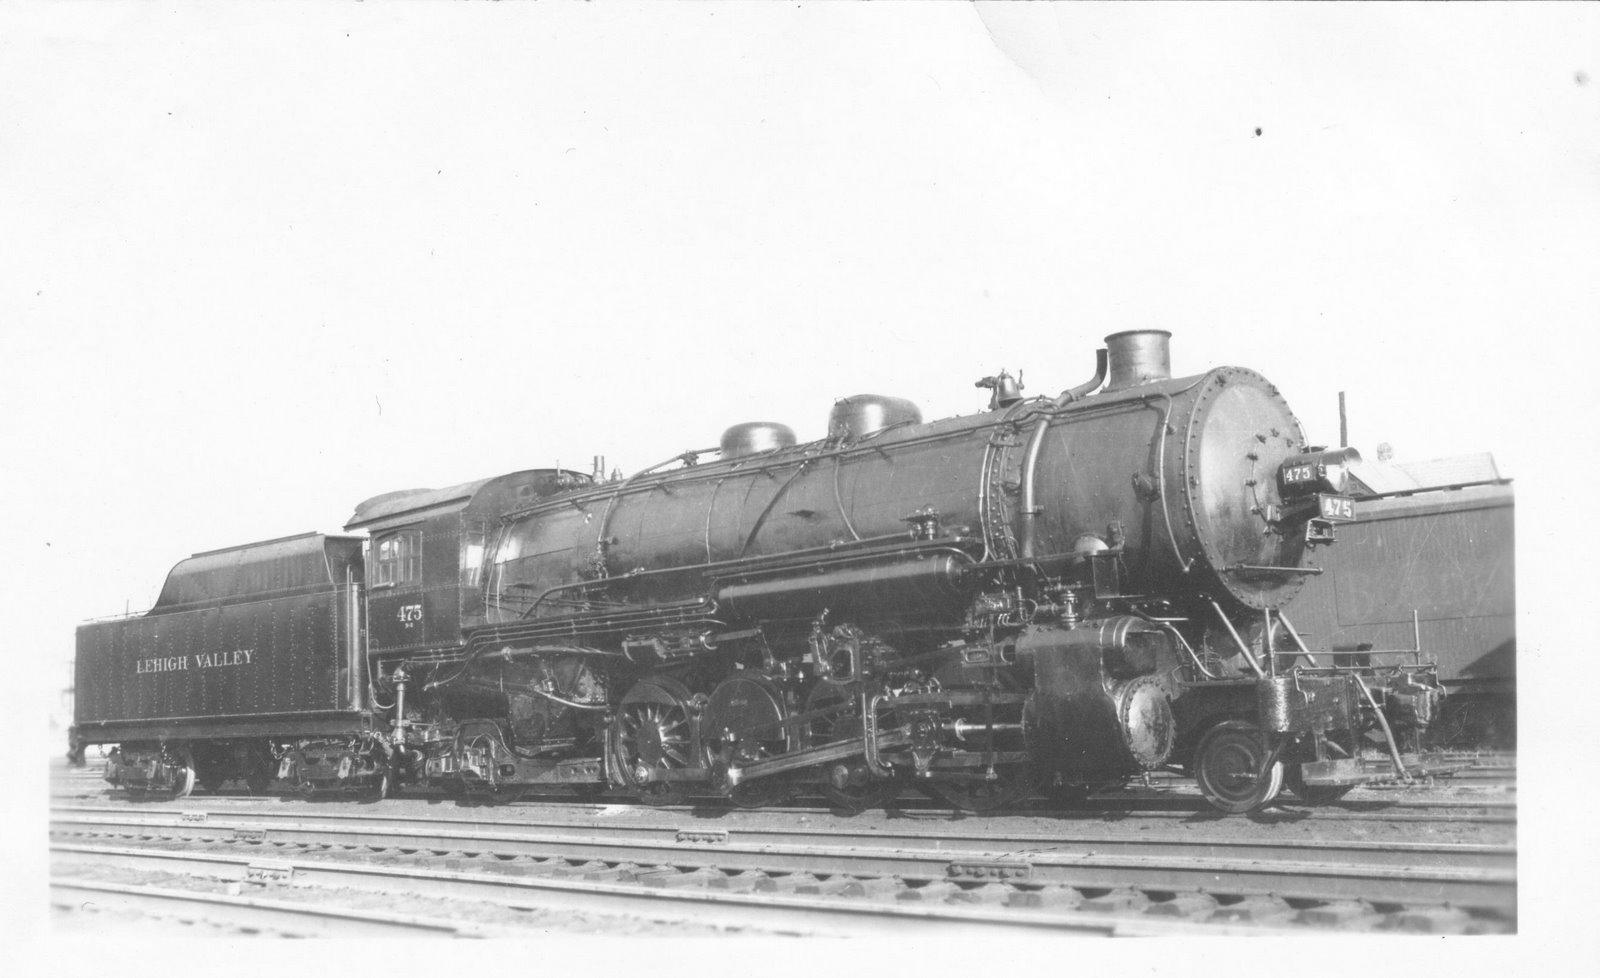 LV 0475